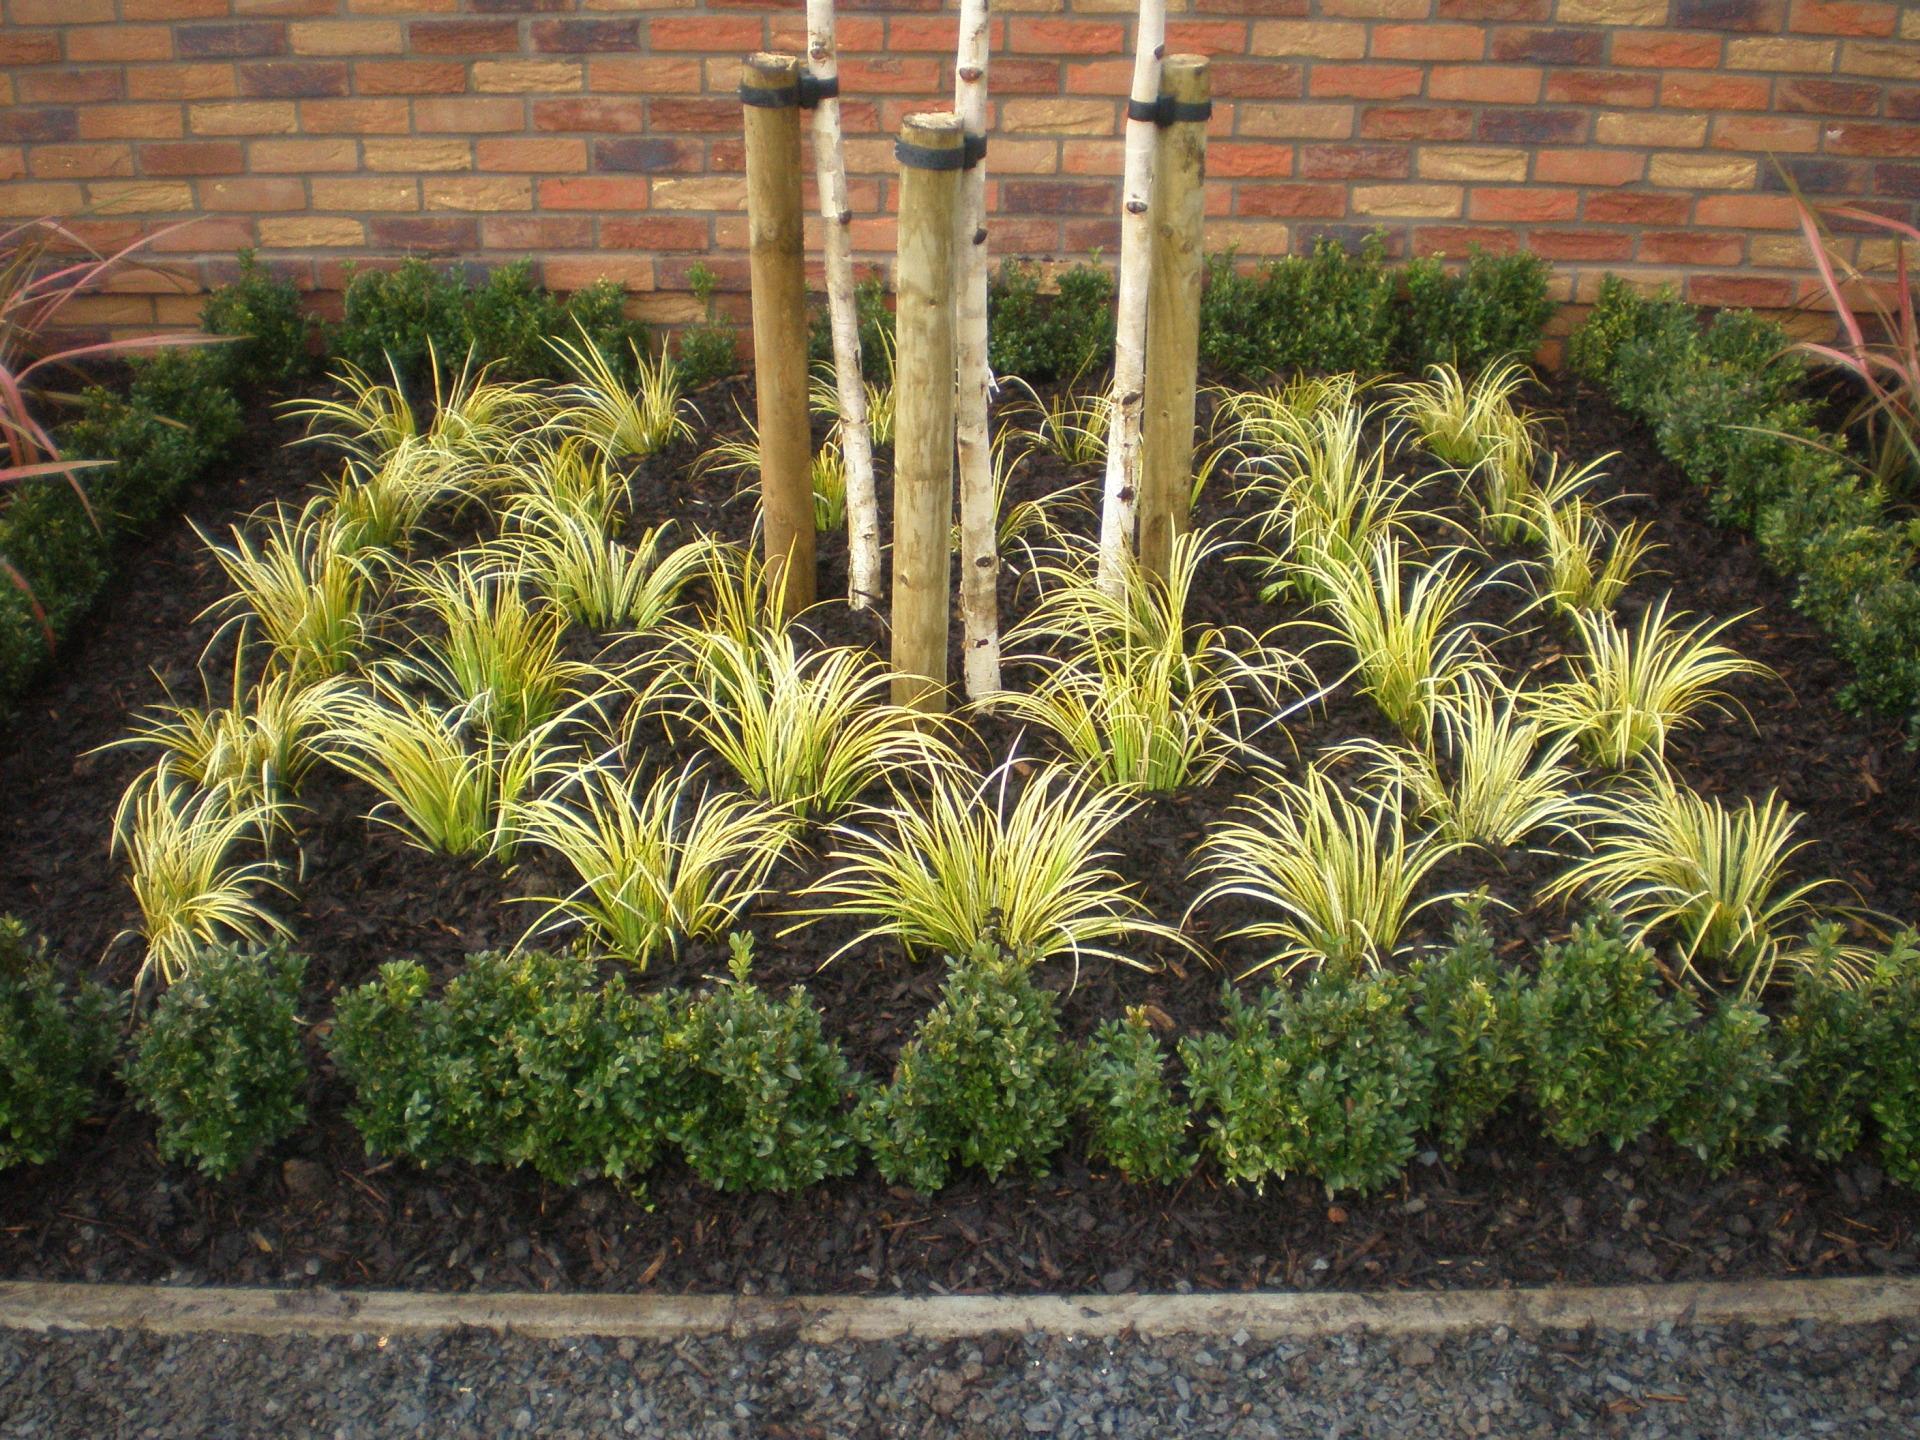 Betula utilis var. jacquemontii Acorus gramineus 'Ogon' Buxus topiary hedge